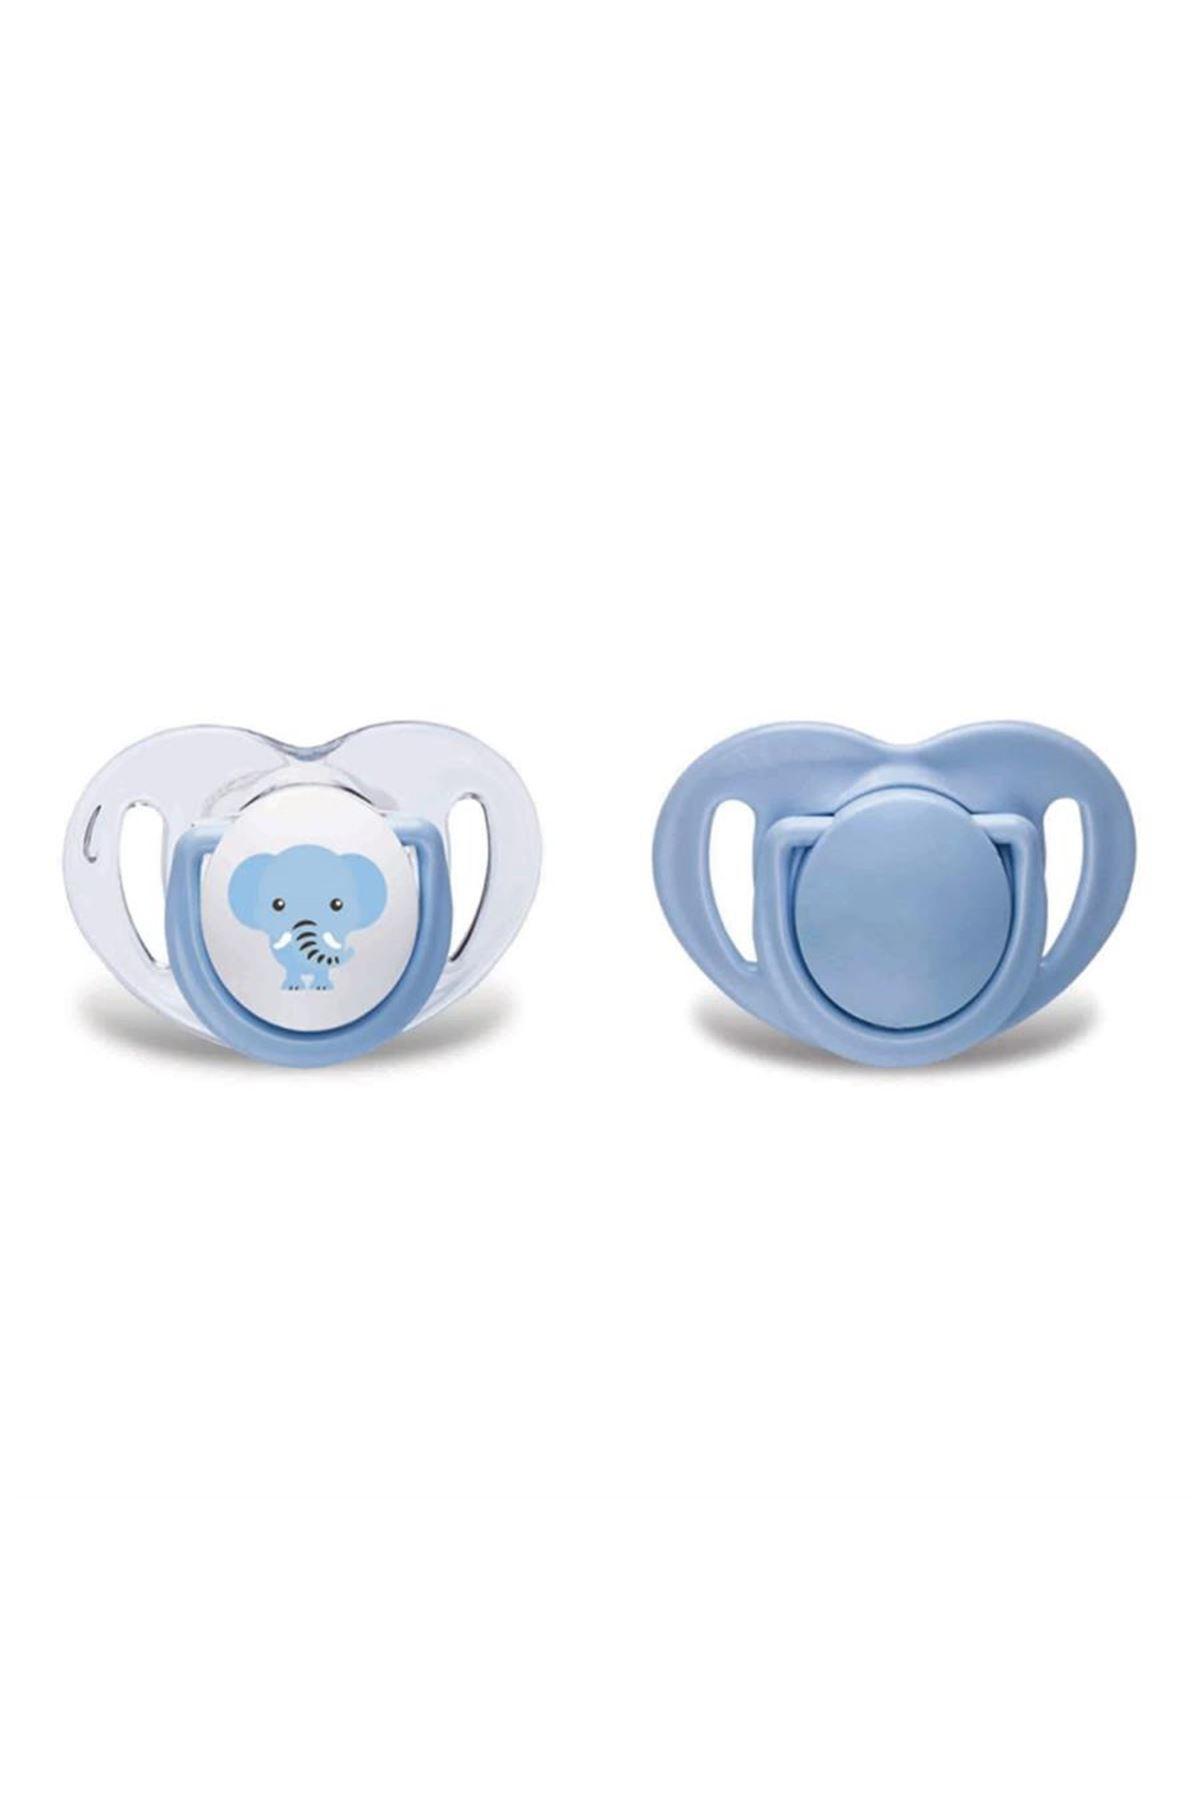 Mamajoo Silikon Ortodontik İkili Emzik Mavi Fil / 6 ay +